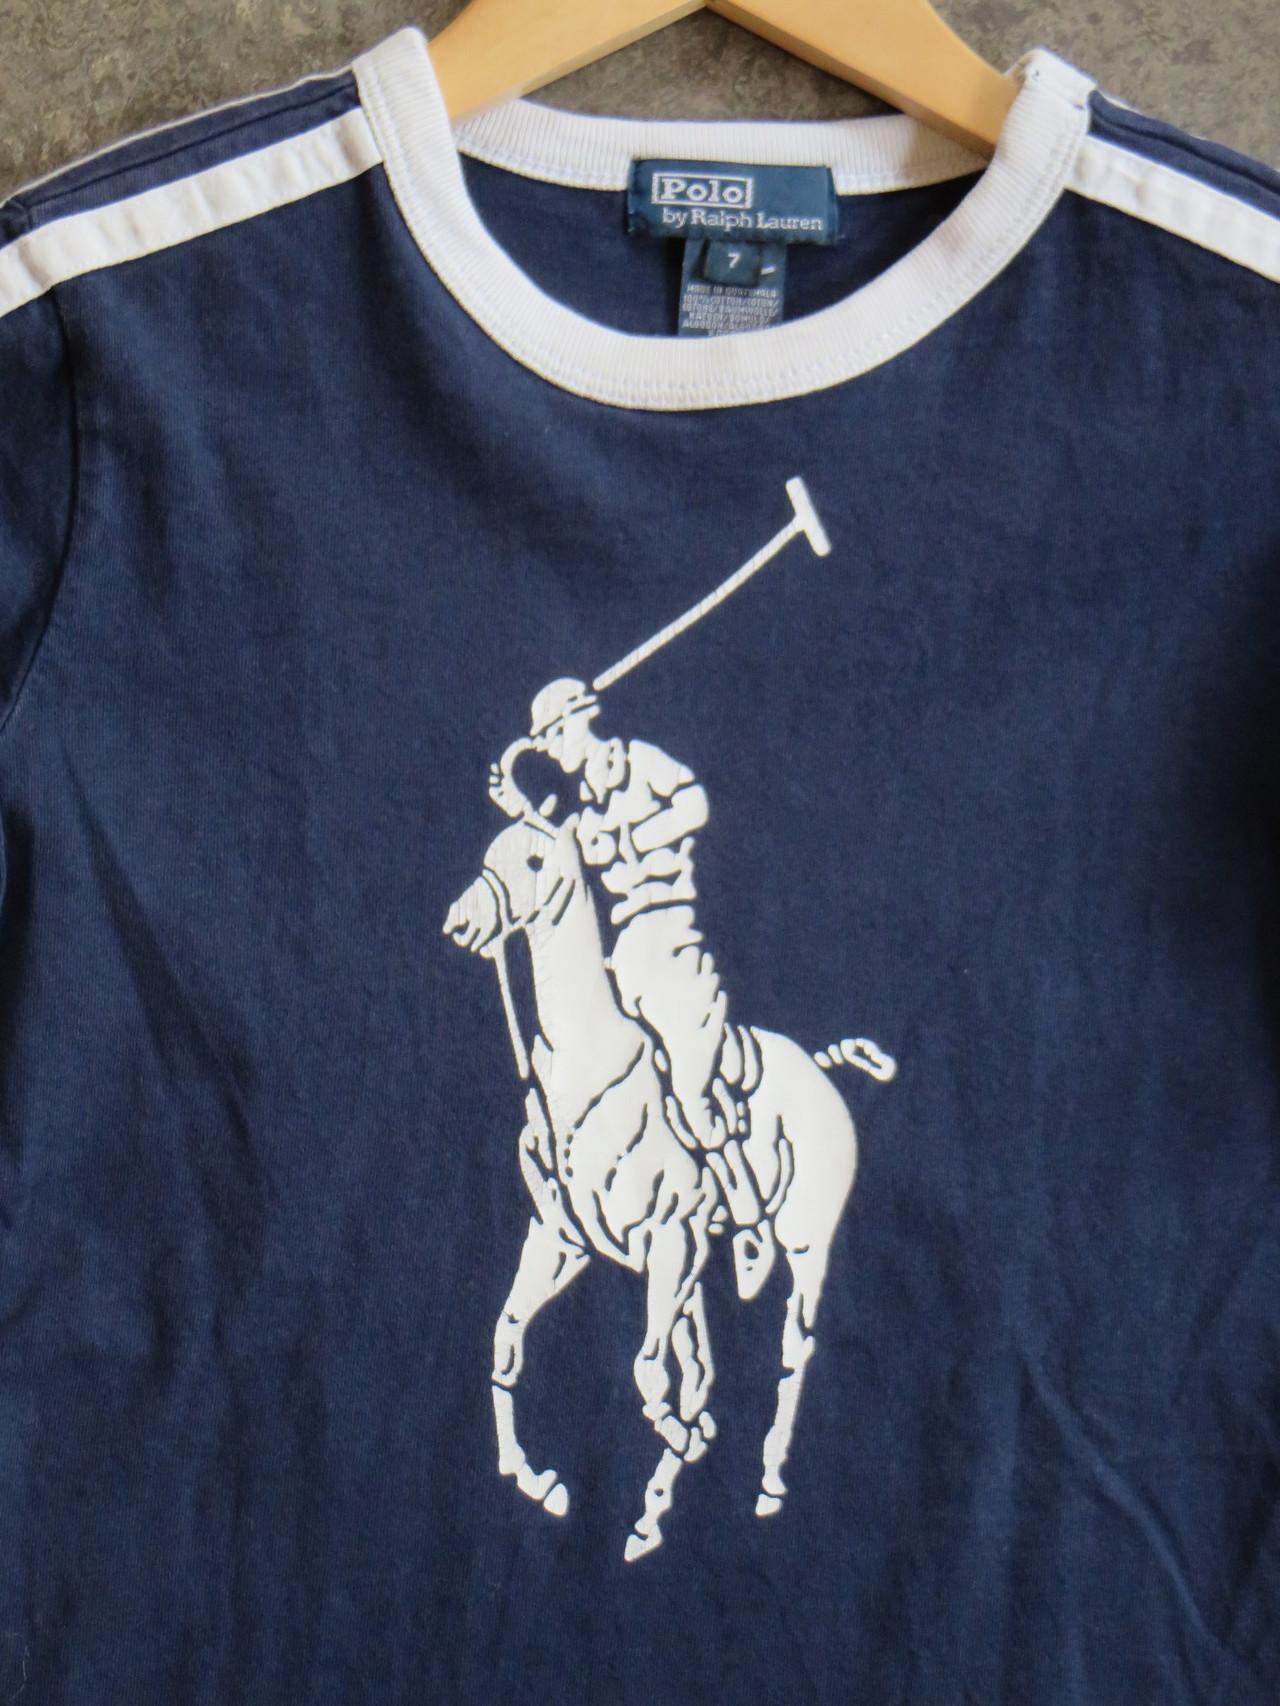 Tshirt - 3/4 Y - Ralph Lauren - 19,50 chf - Second Hand